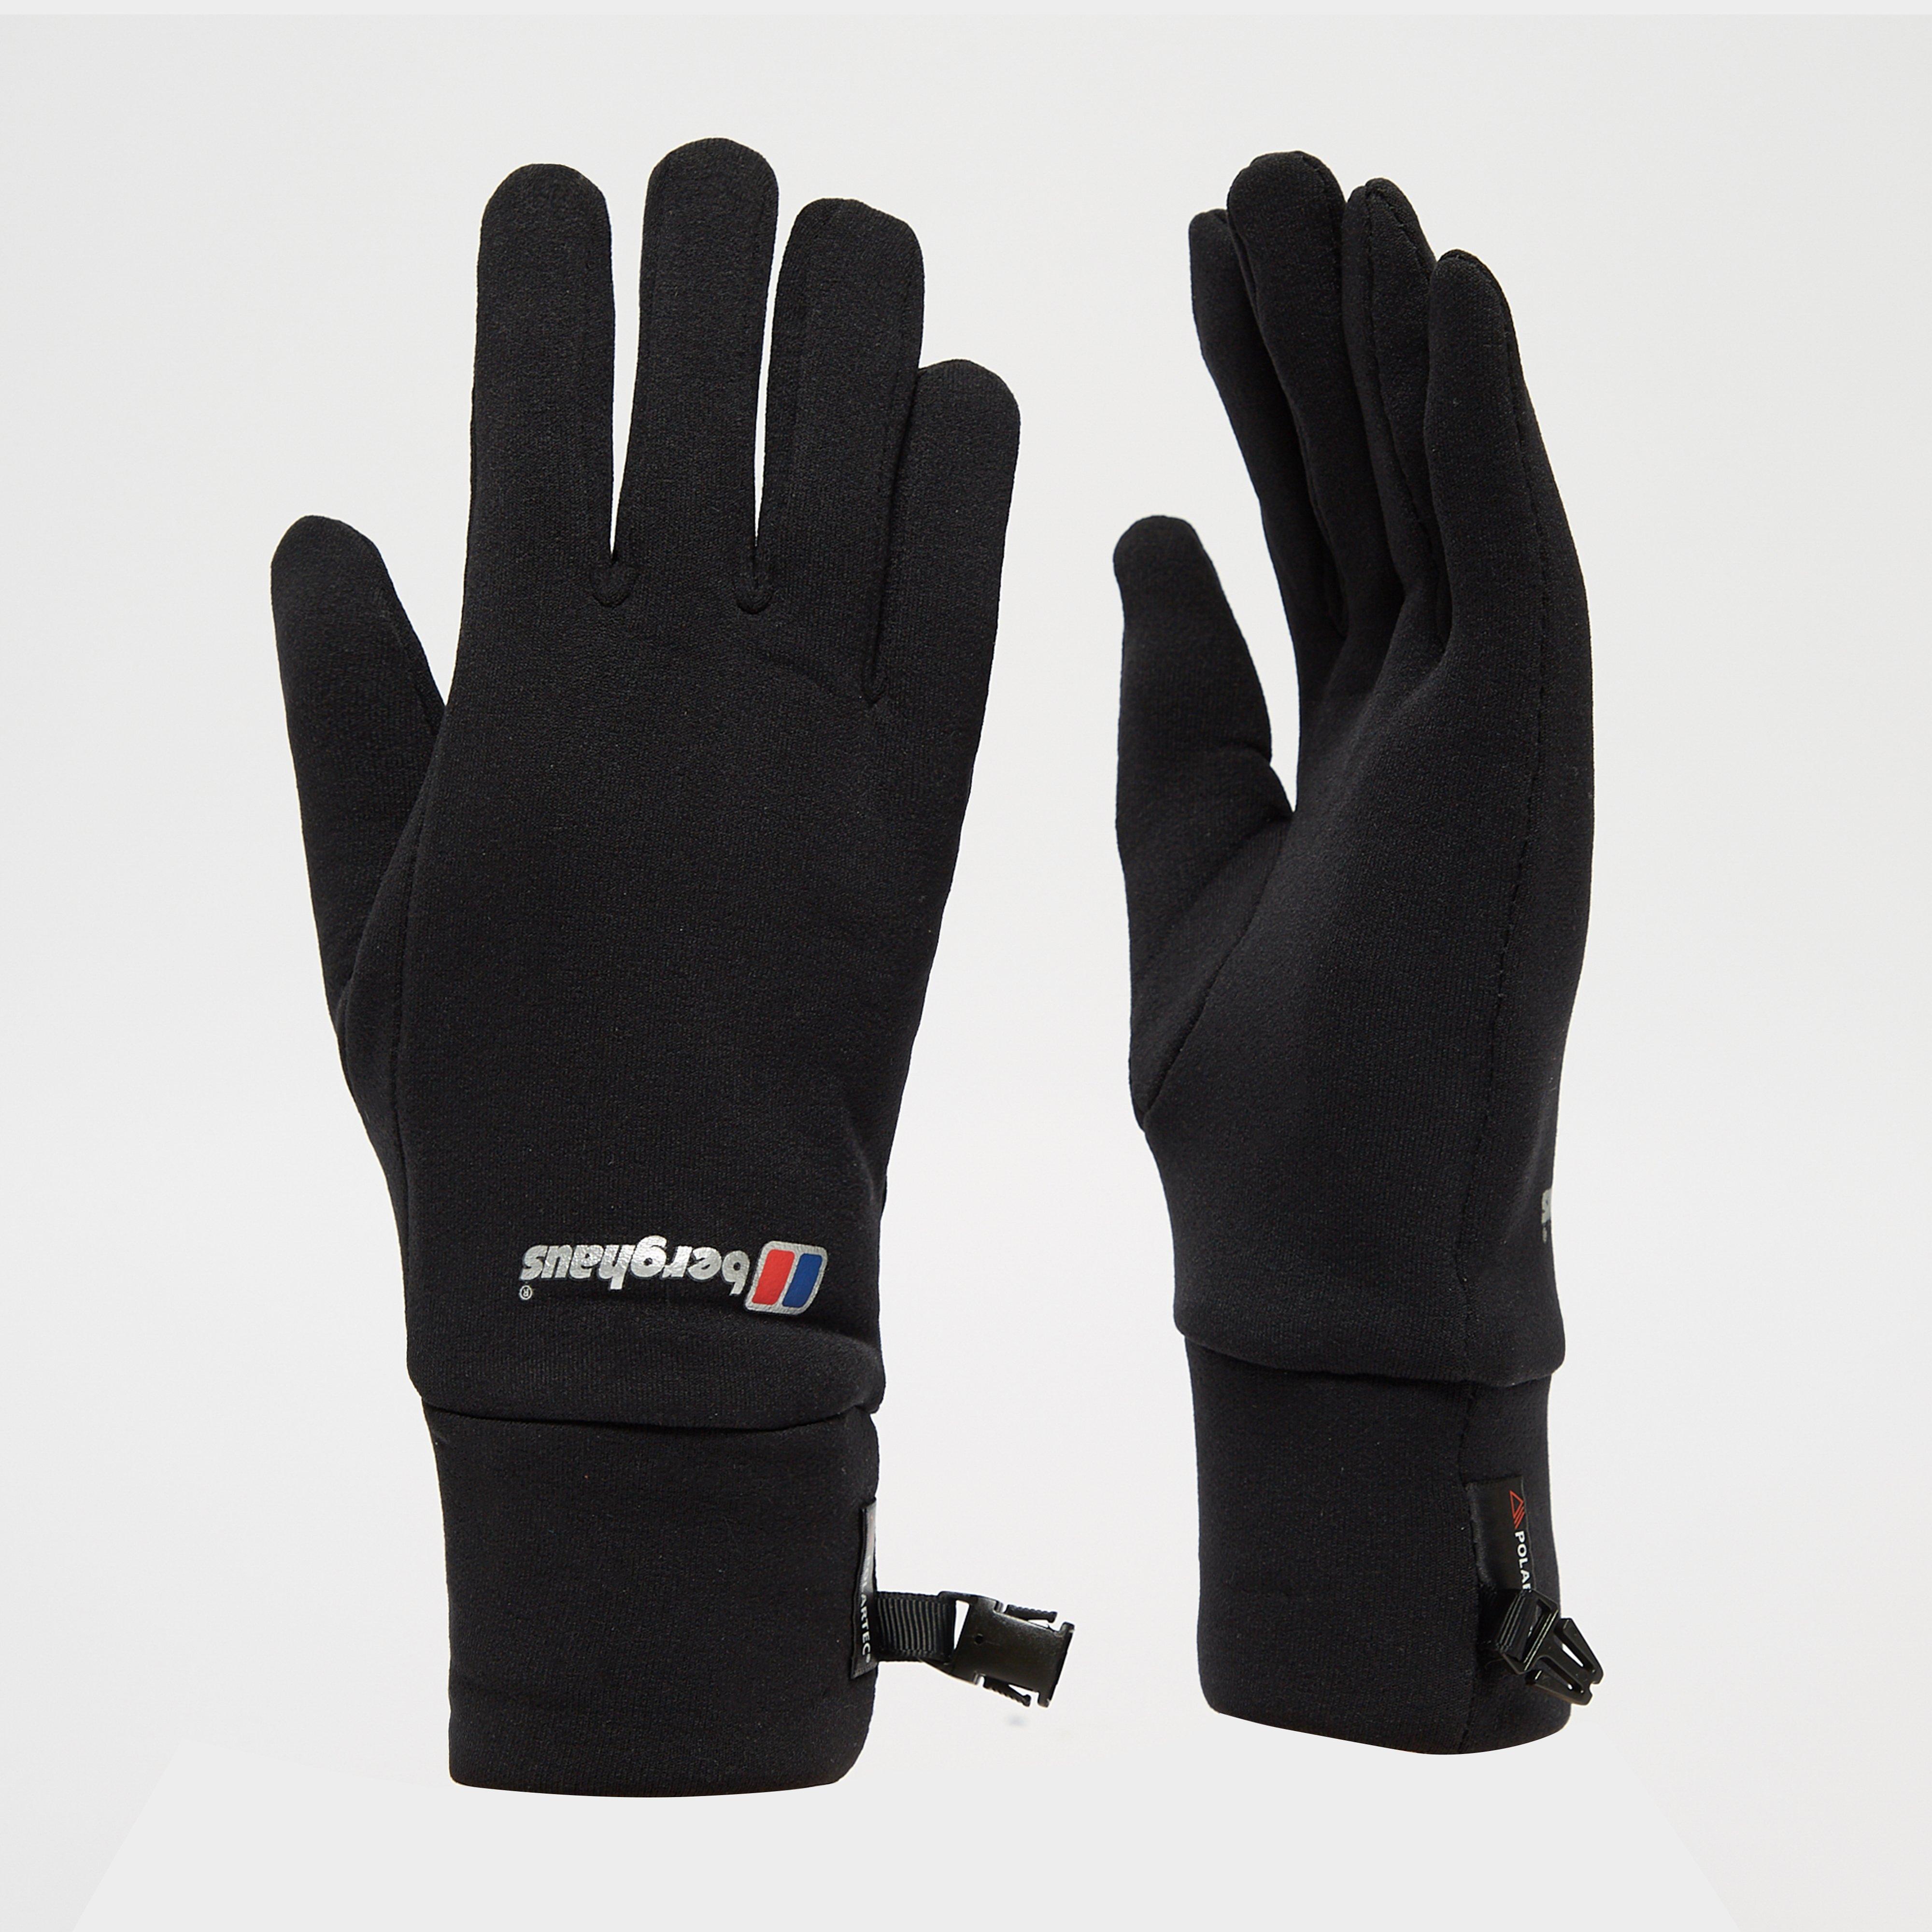 Berghaus Power Stretch Gloves - Black/black  Black/black